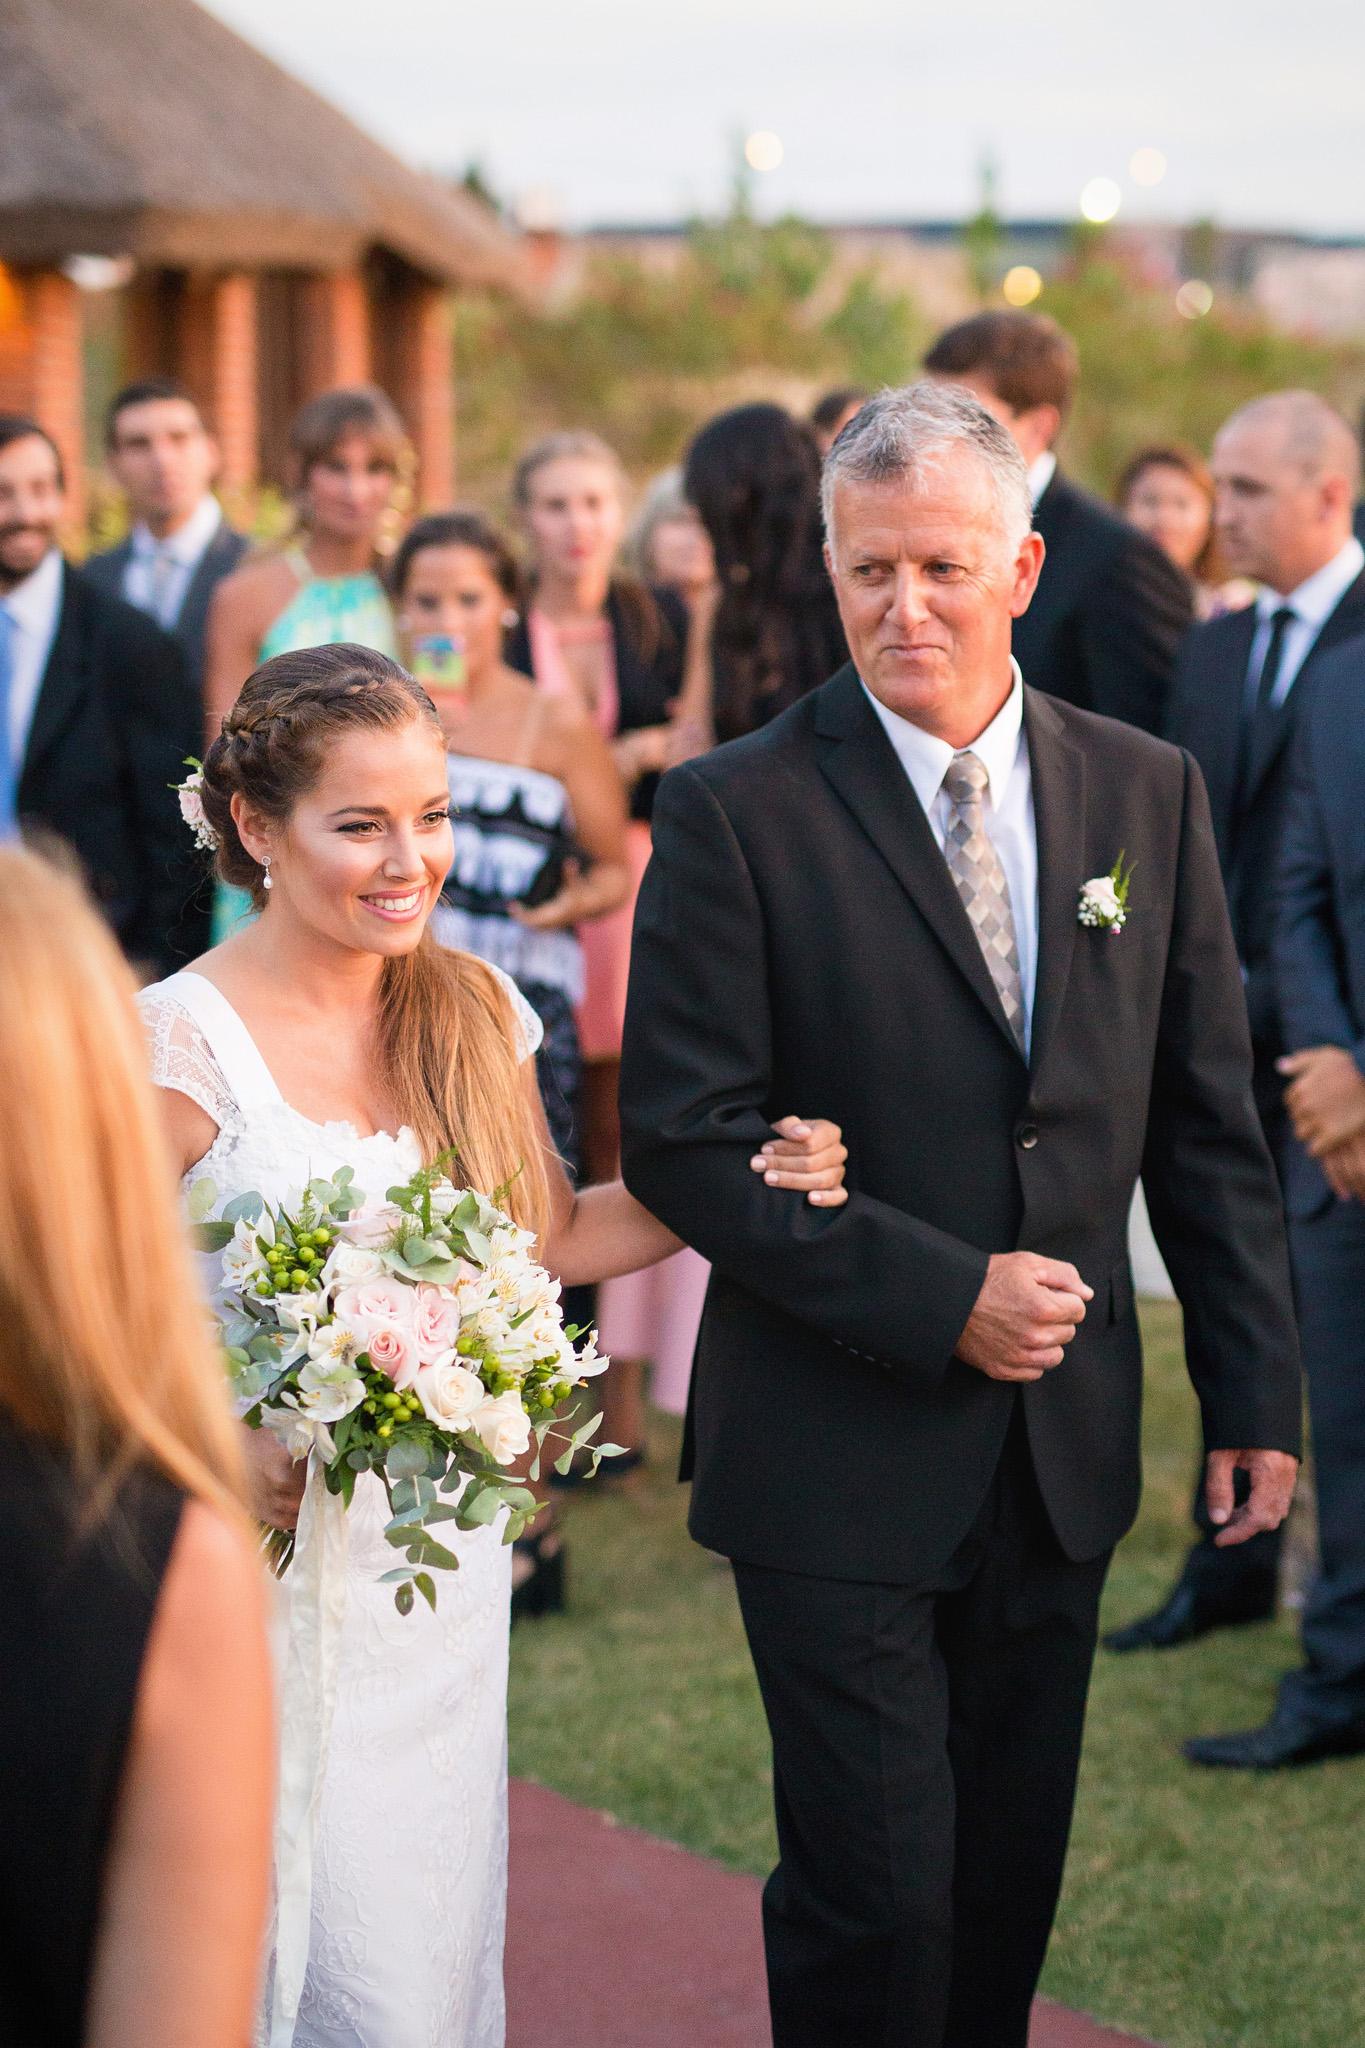 Wedding_Travellers_Destination_Wedding_Photography-44.jpg